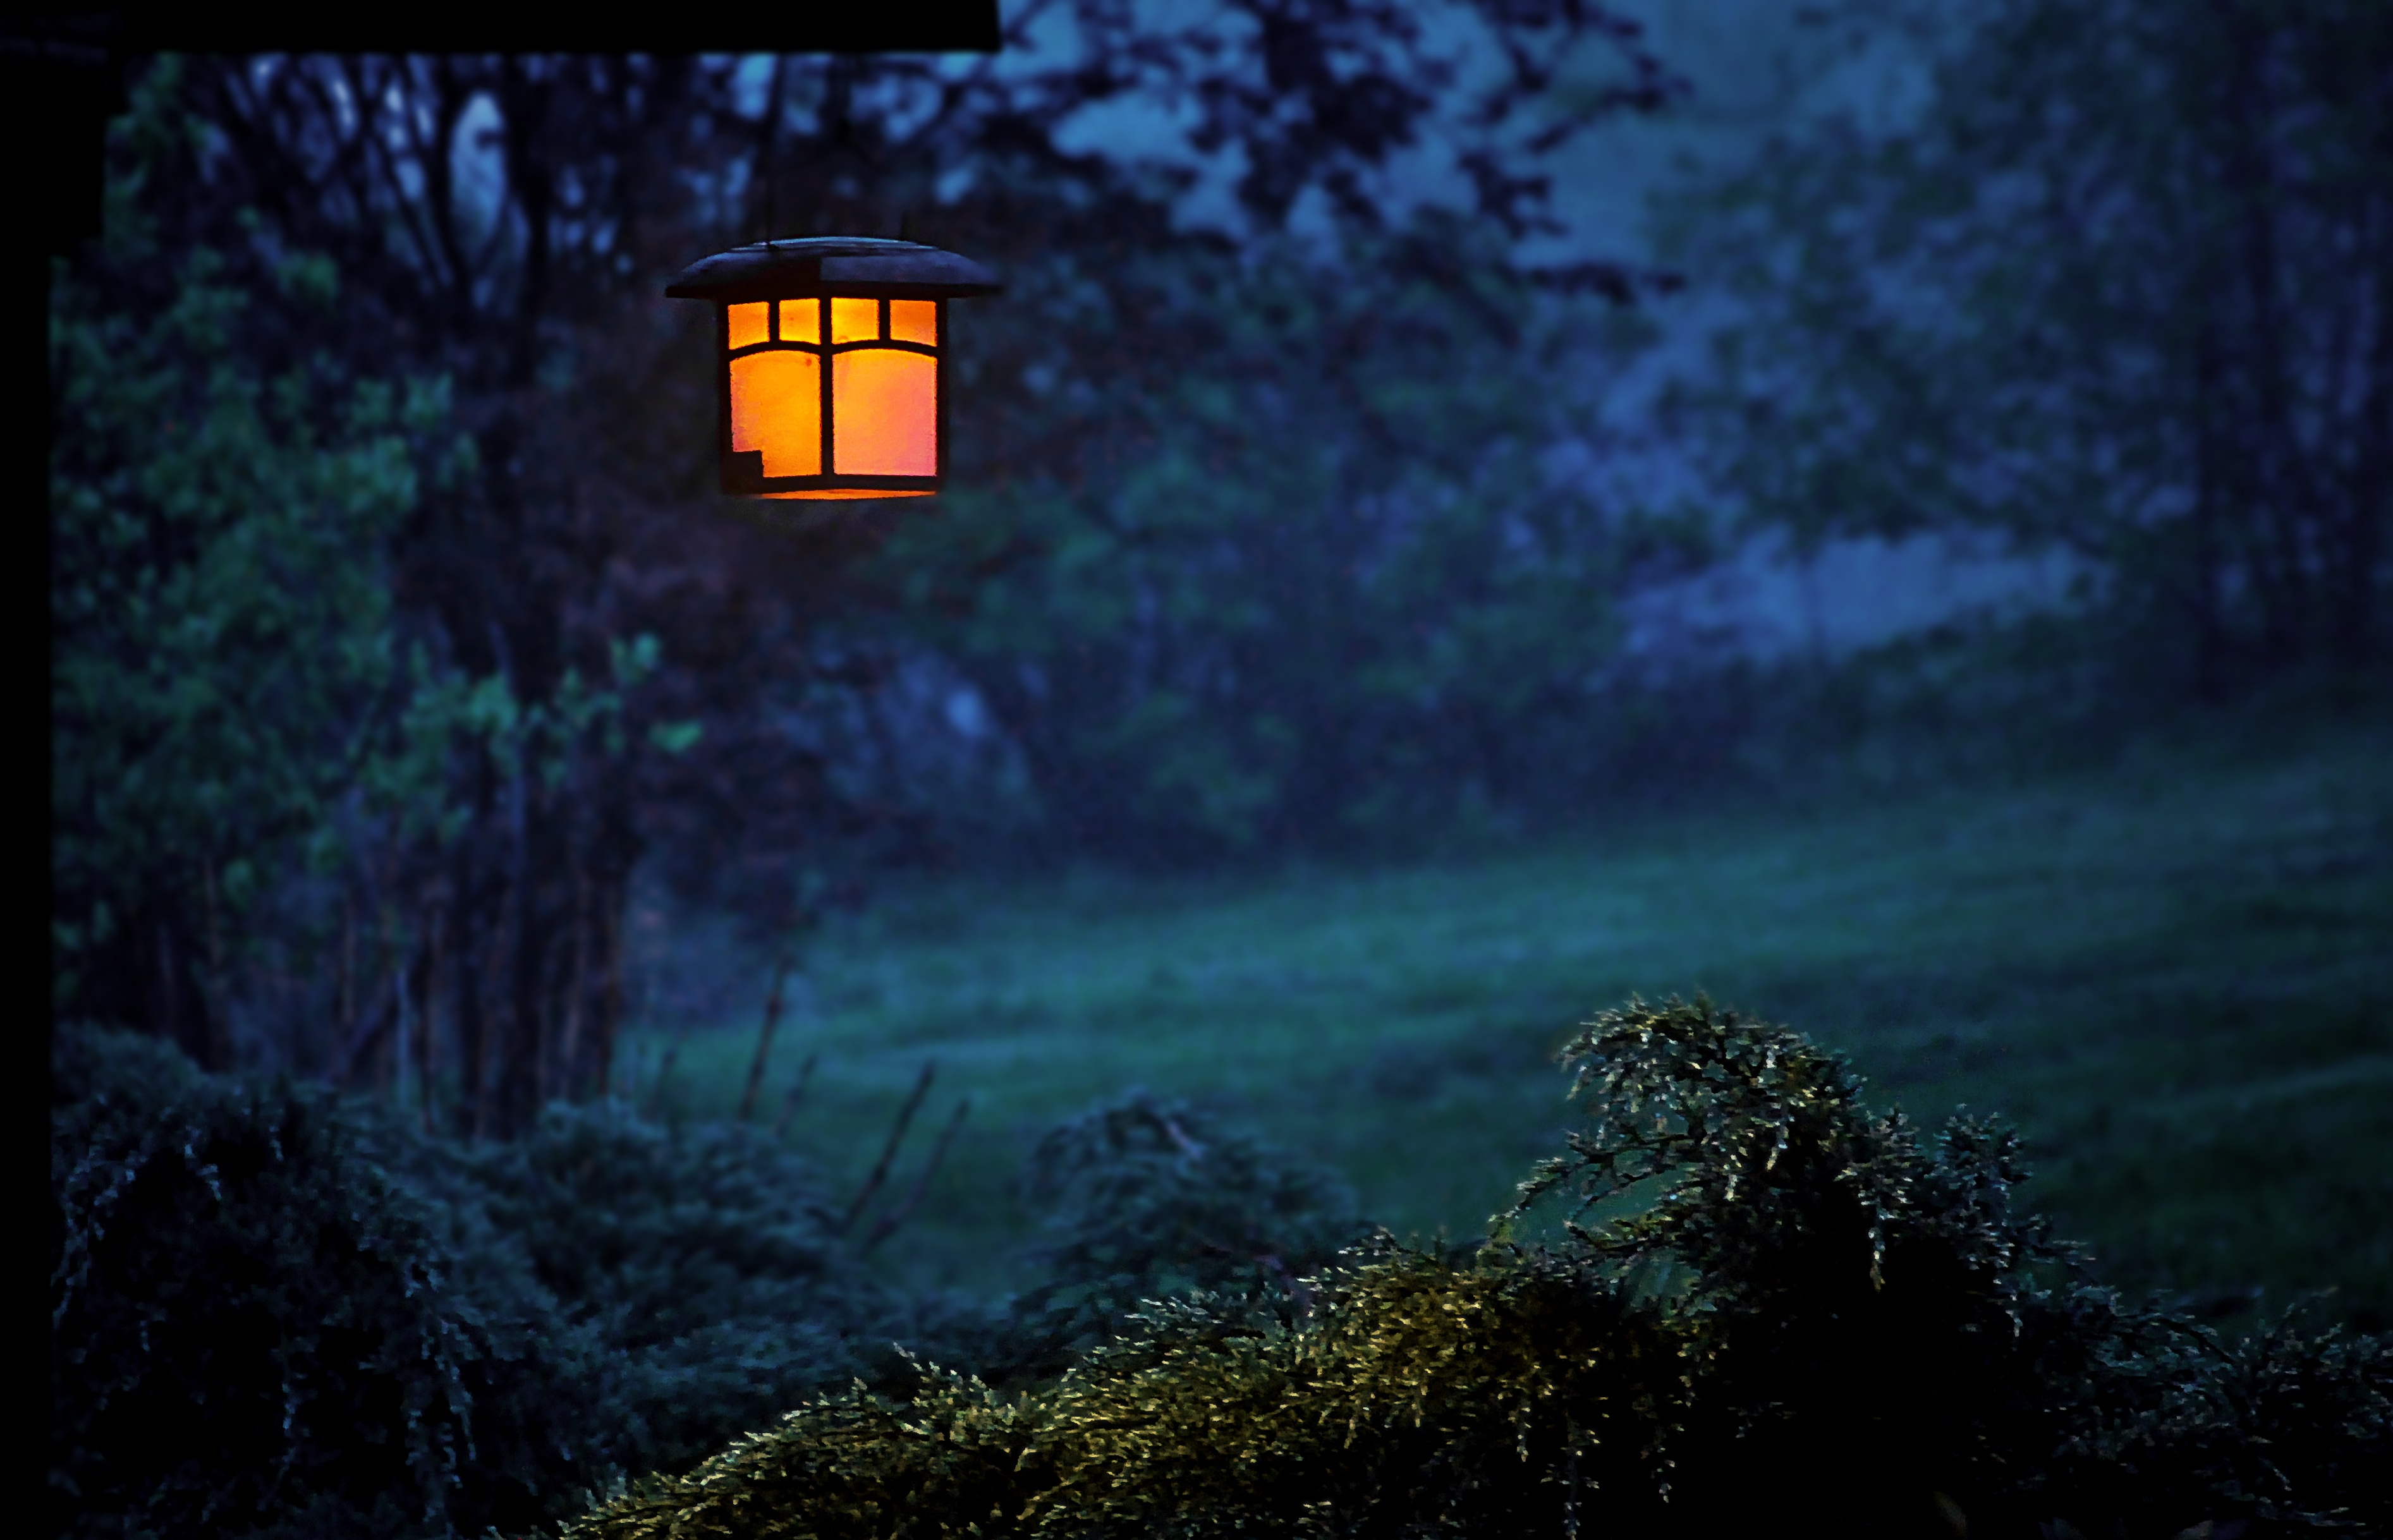 Twilight Lamp Evening Outdoors, HD Photography, 4k ...